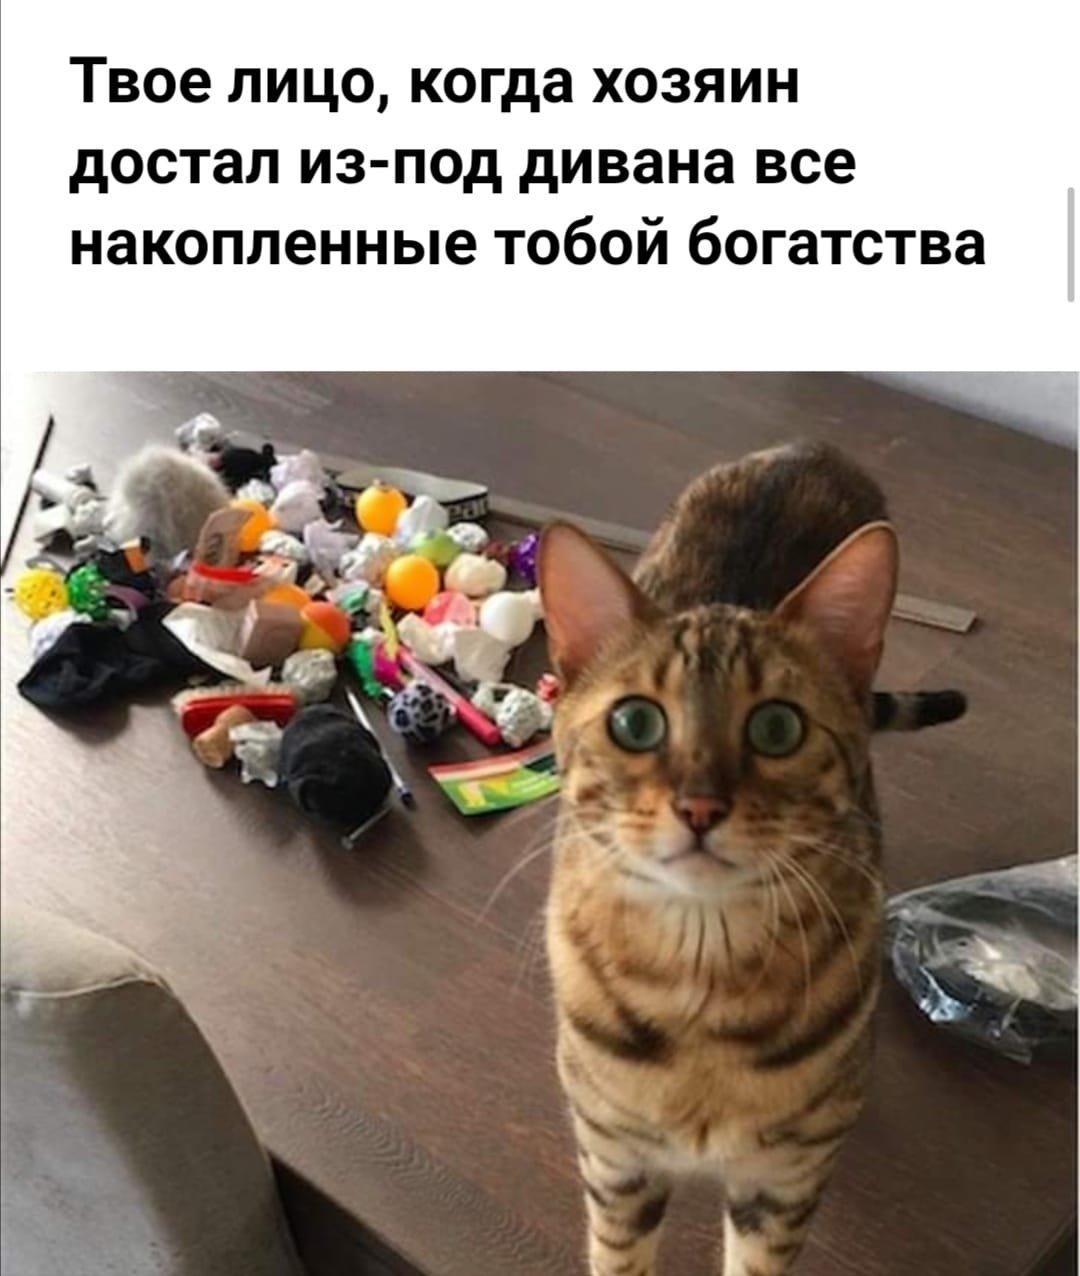 Без кота и жизнь не та. Подборка смешных картинок с котиками, фото-4